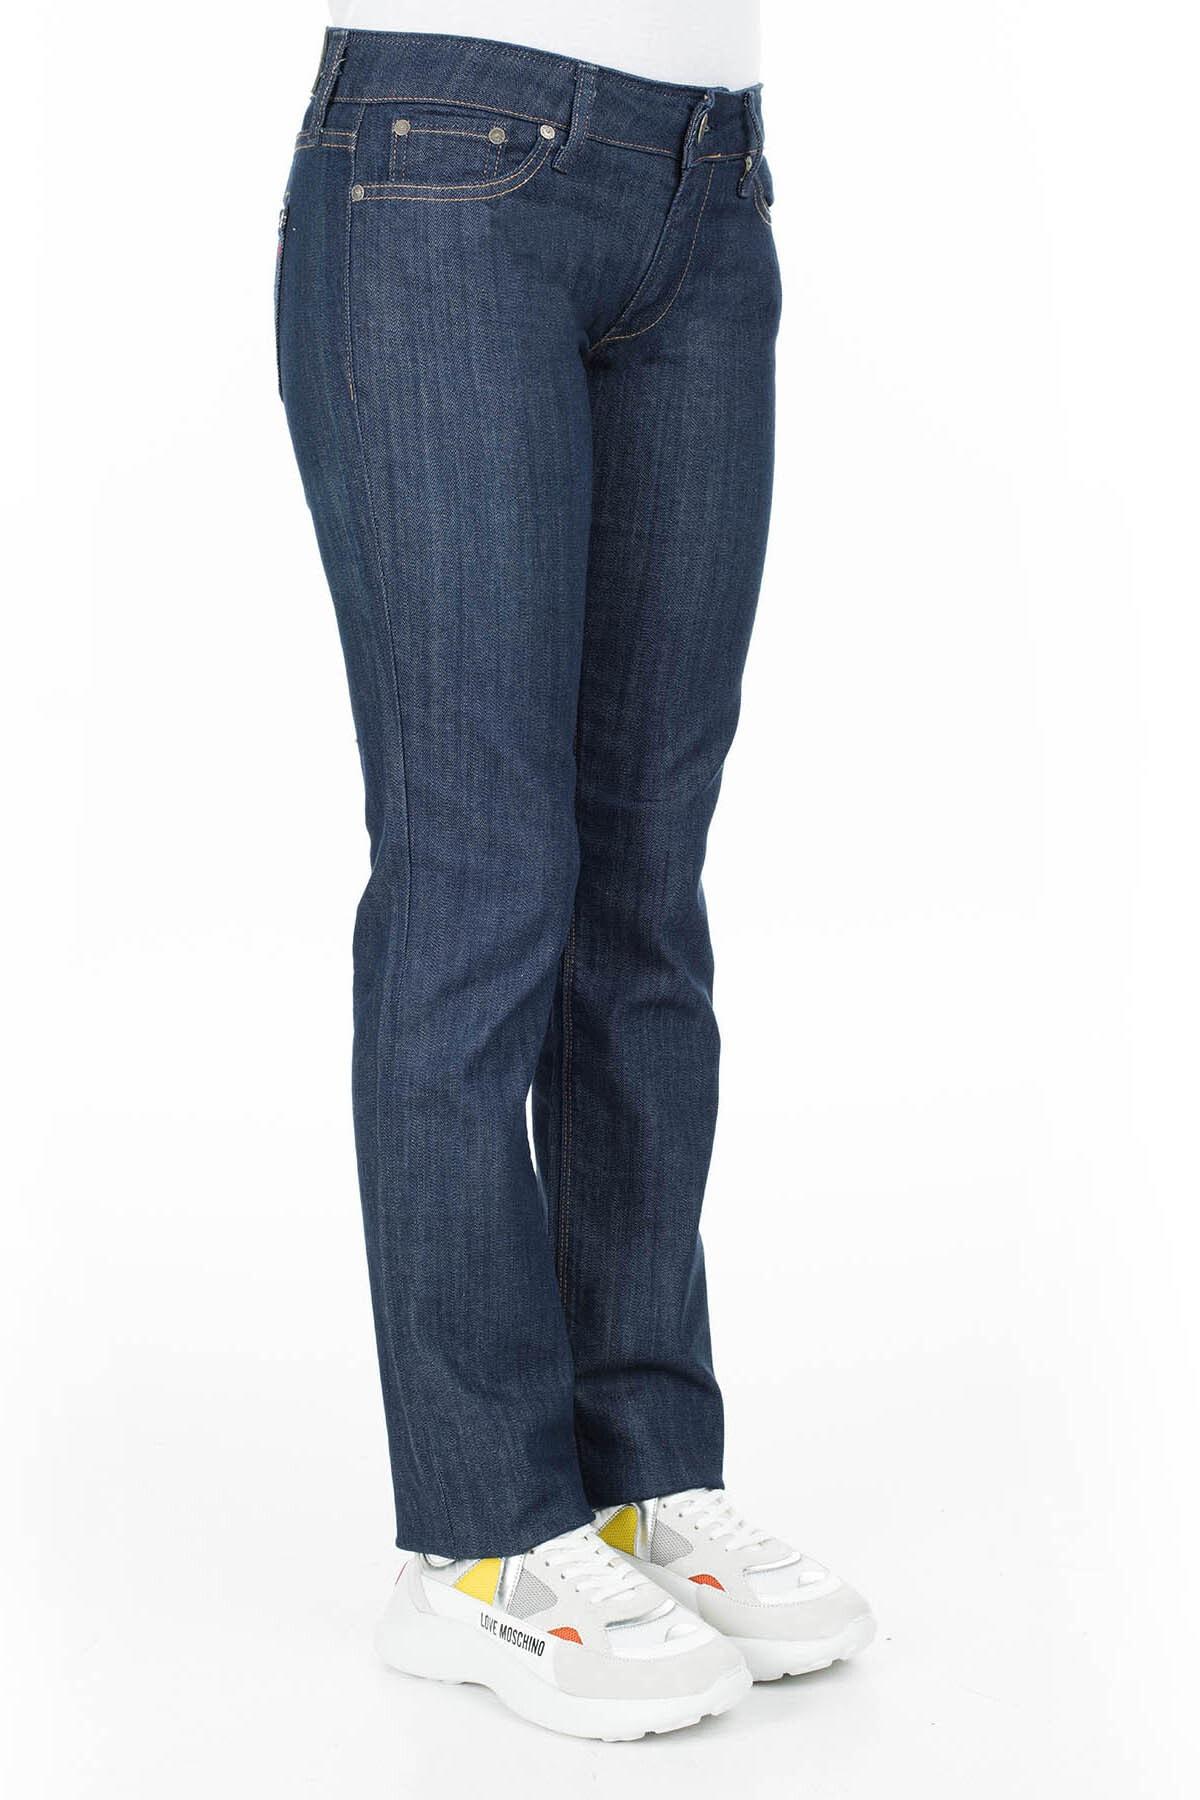 Replay Jeans Kadın Kot Pantolon Zoxwv591 2